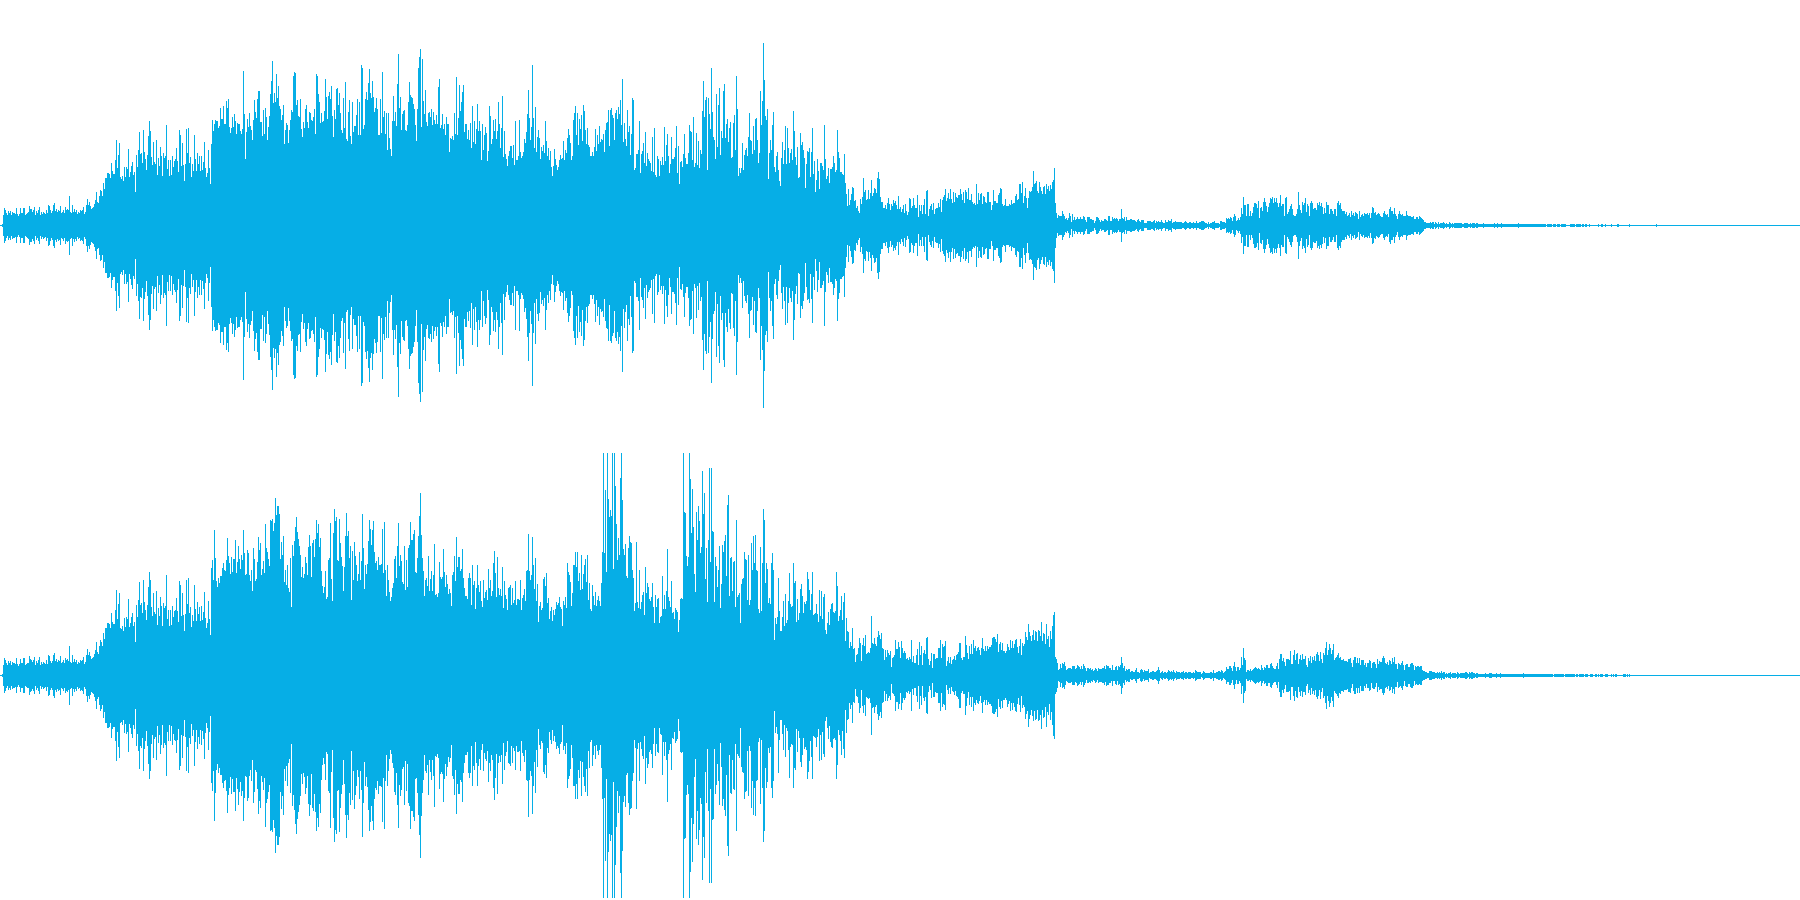 FMラジオ的ジングル1の再生済みの波形